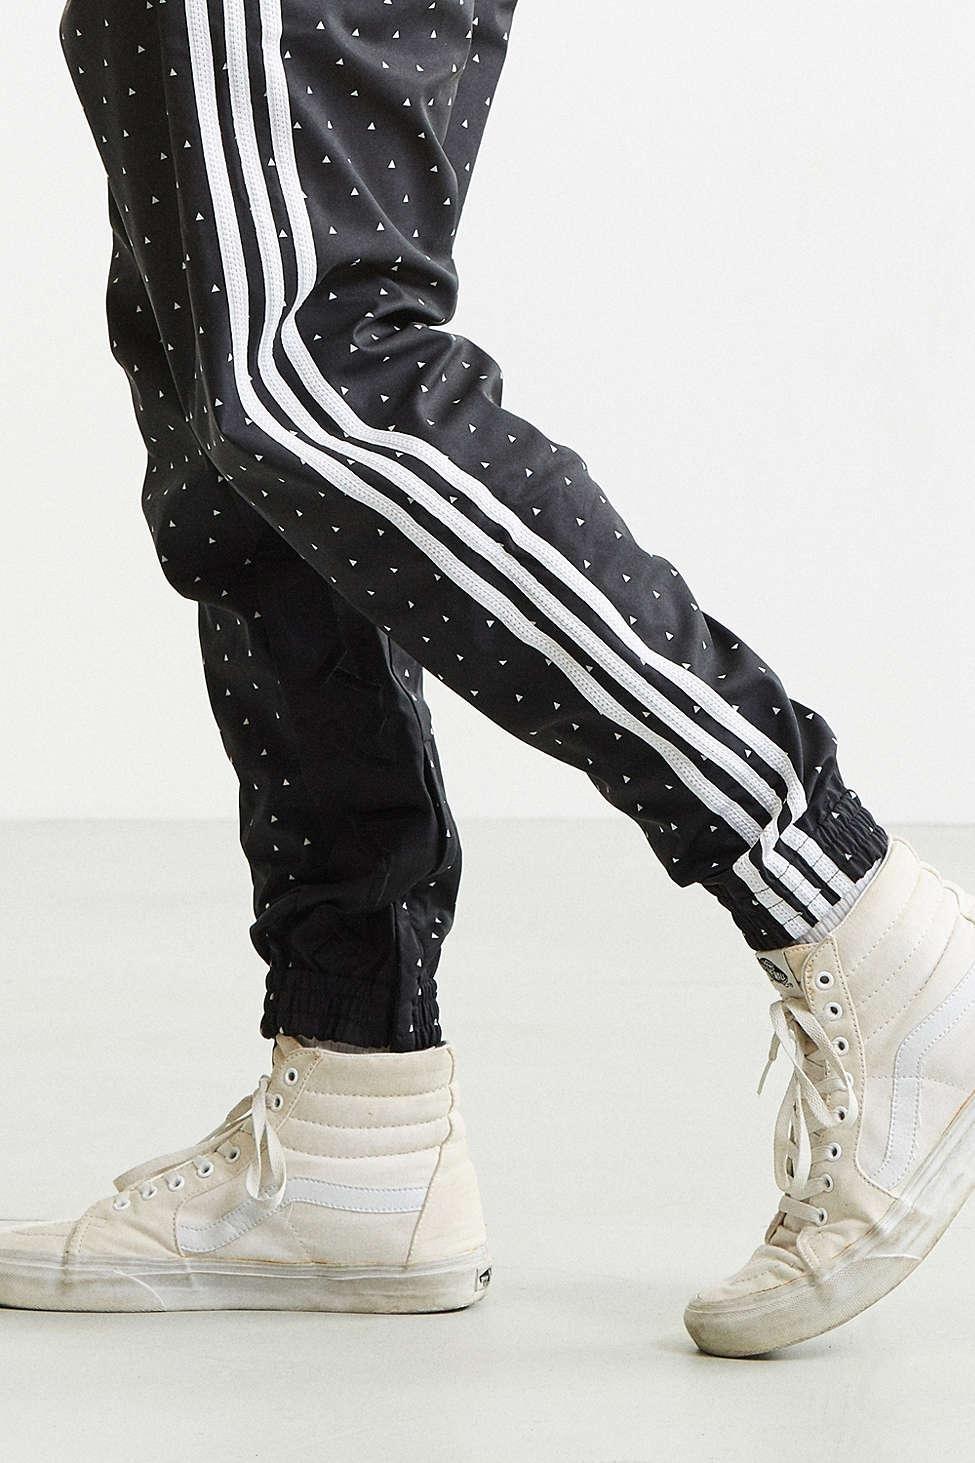 5eb02aeaede63 Lyst - adidas Originals X Pharrell Williams Carrot Fit Track Pant in ...